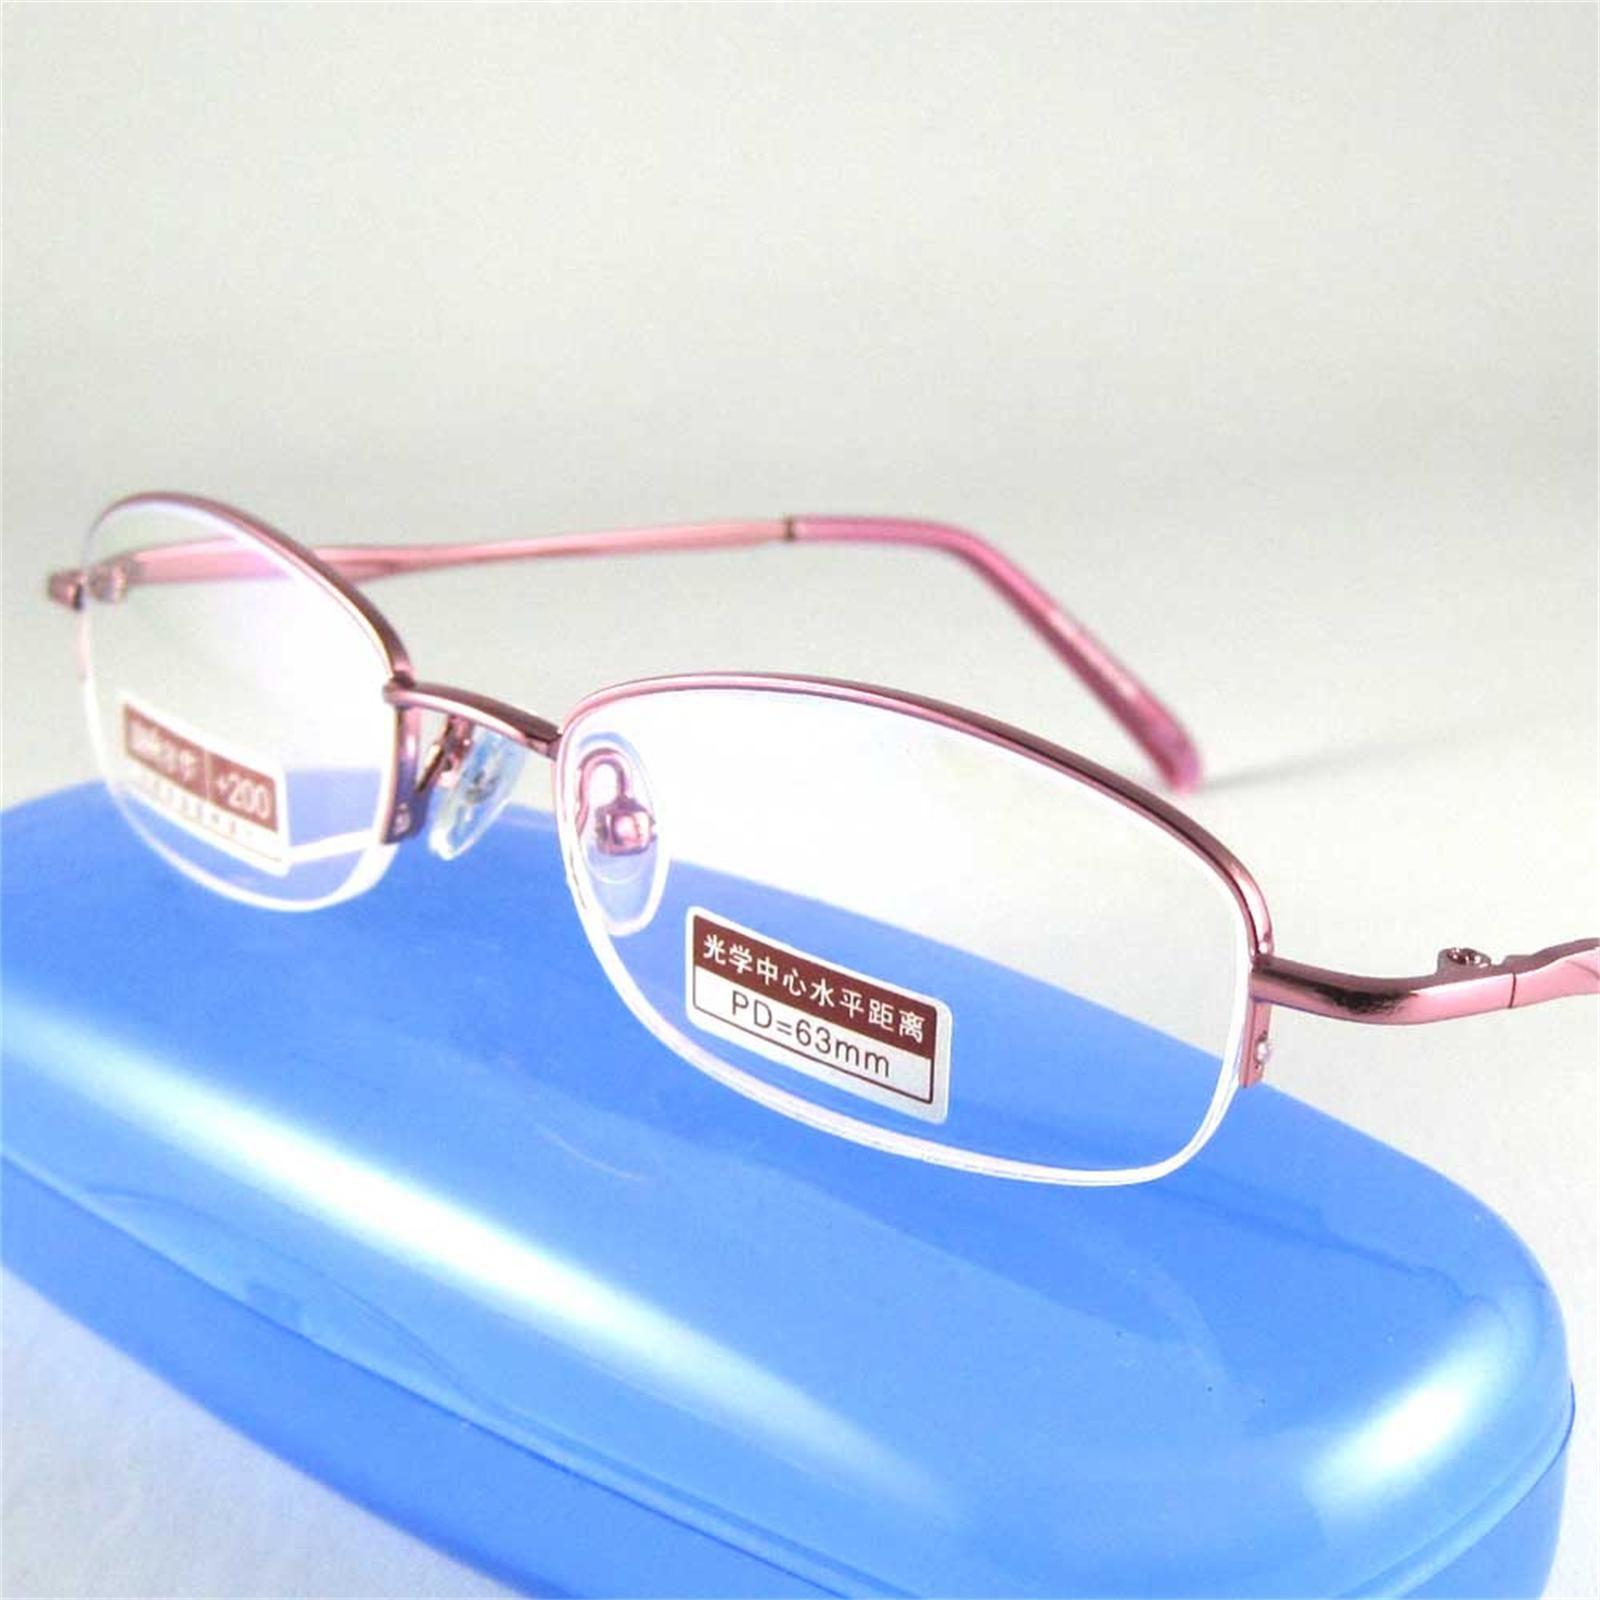 new brand reading glasses eyeglasses eyewear